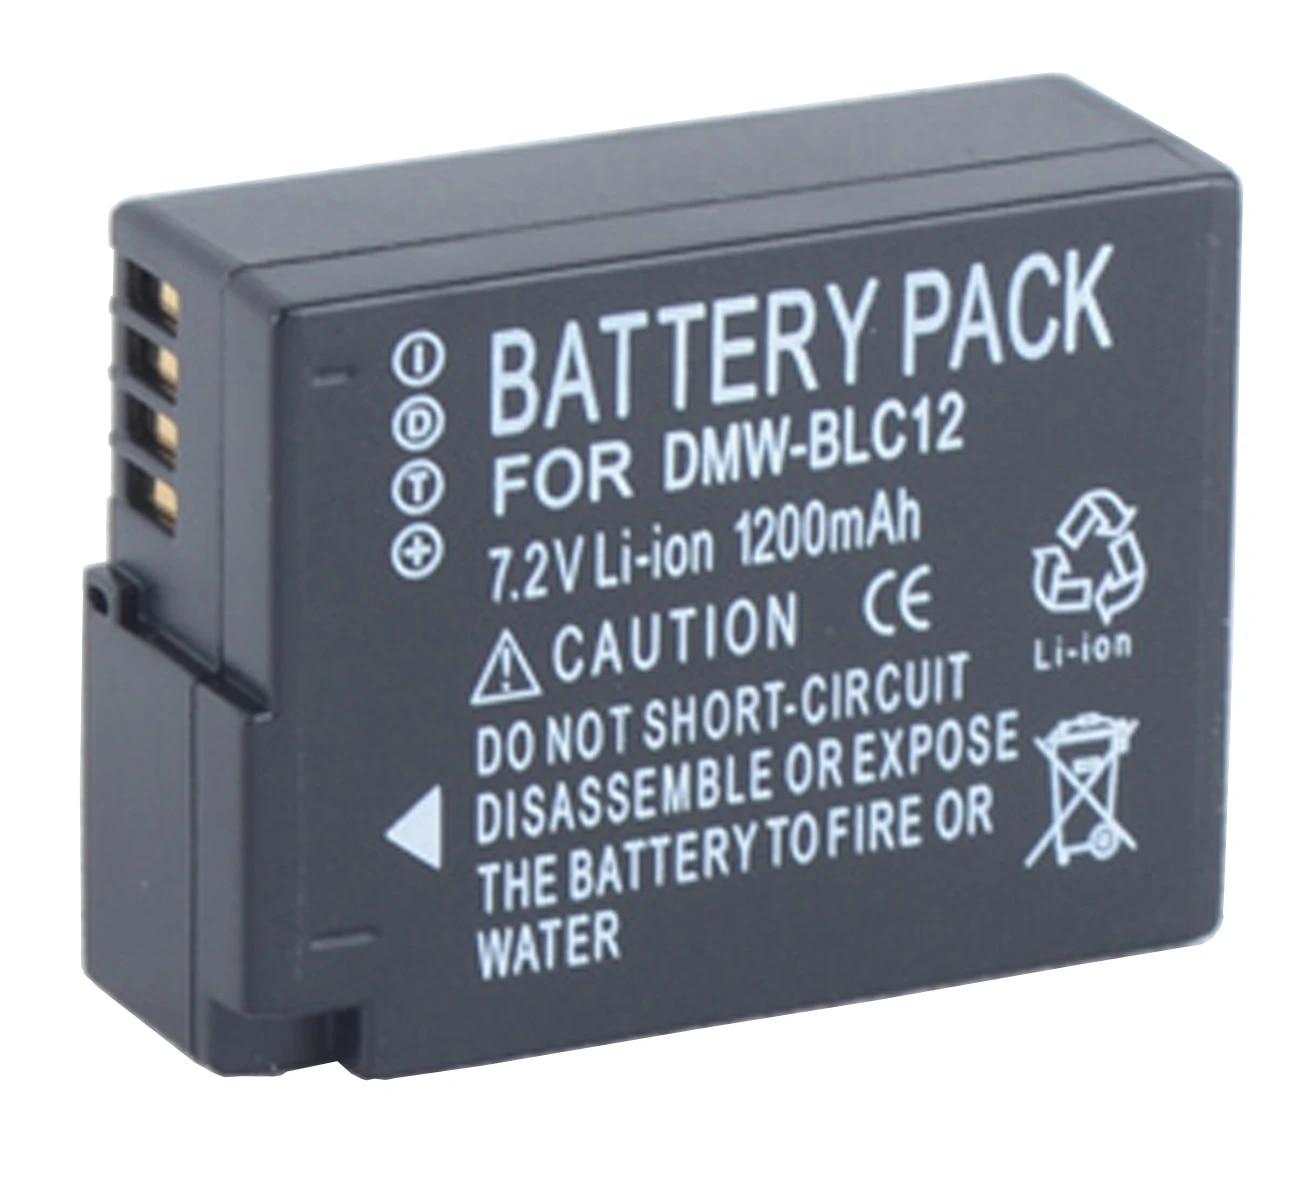 Doble USB Cargador De Batería Para Panasonic Lumix DMC-FZ300 DMC-FZ2000 DMC-FZ2500